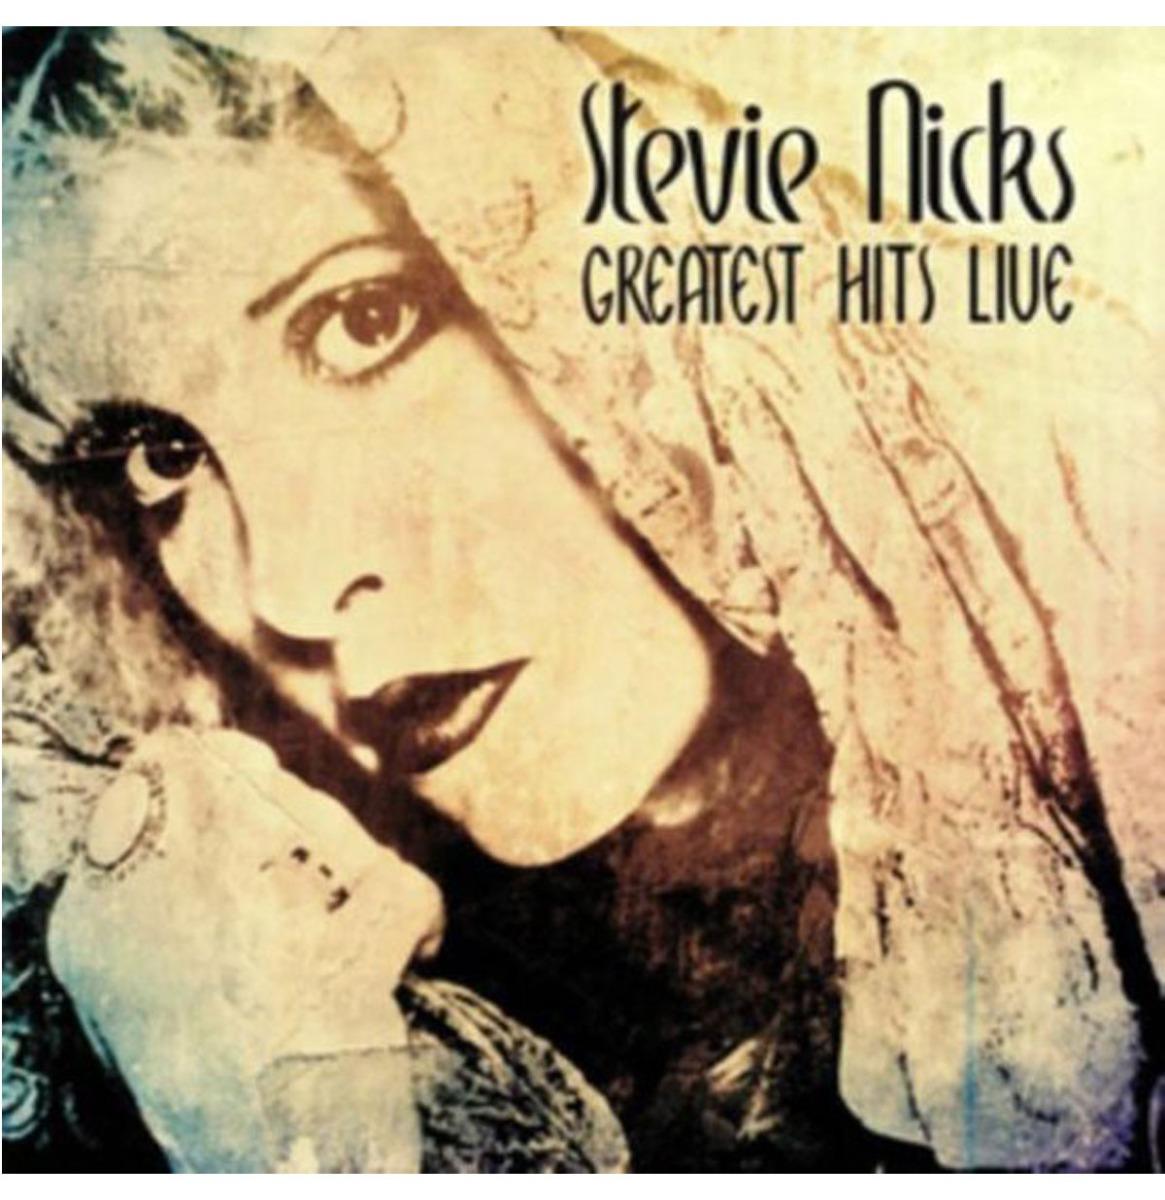 Stevie Nicks - Greatest Hits Live LP